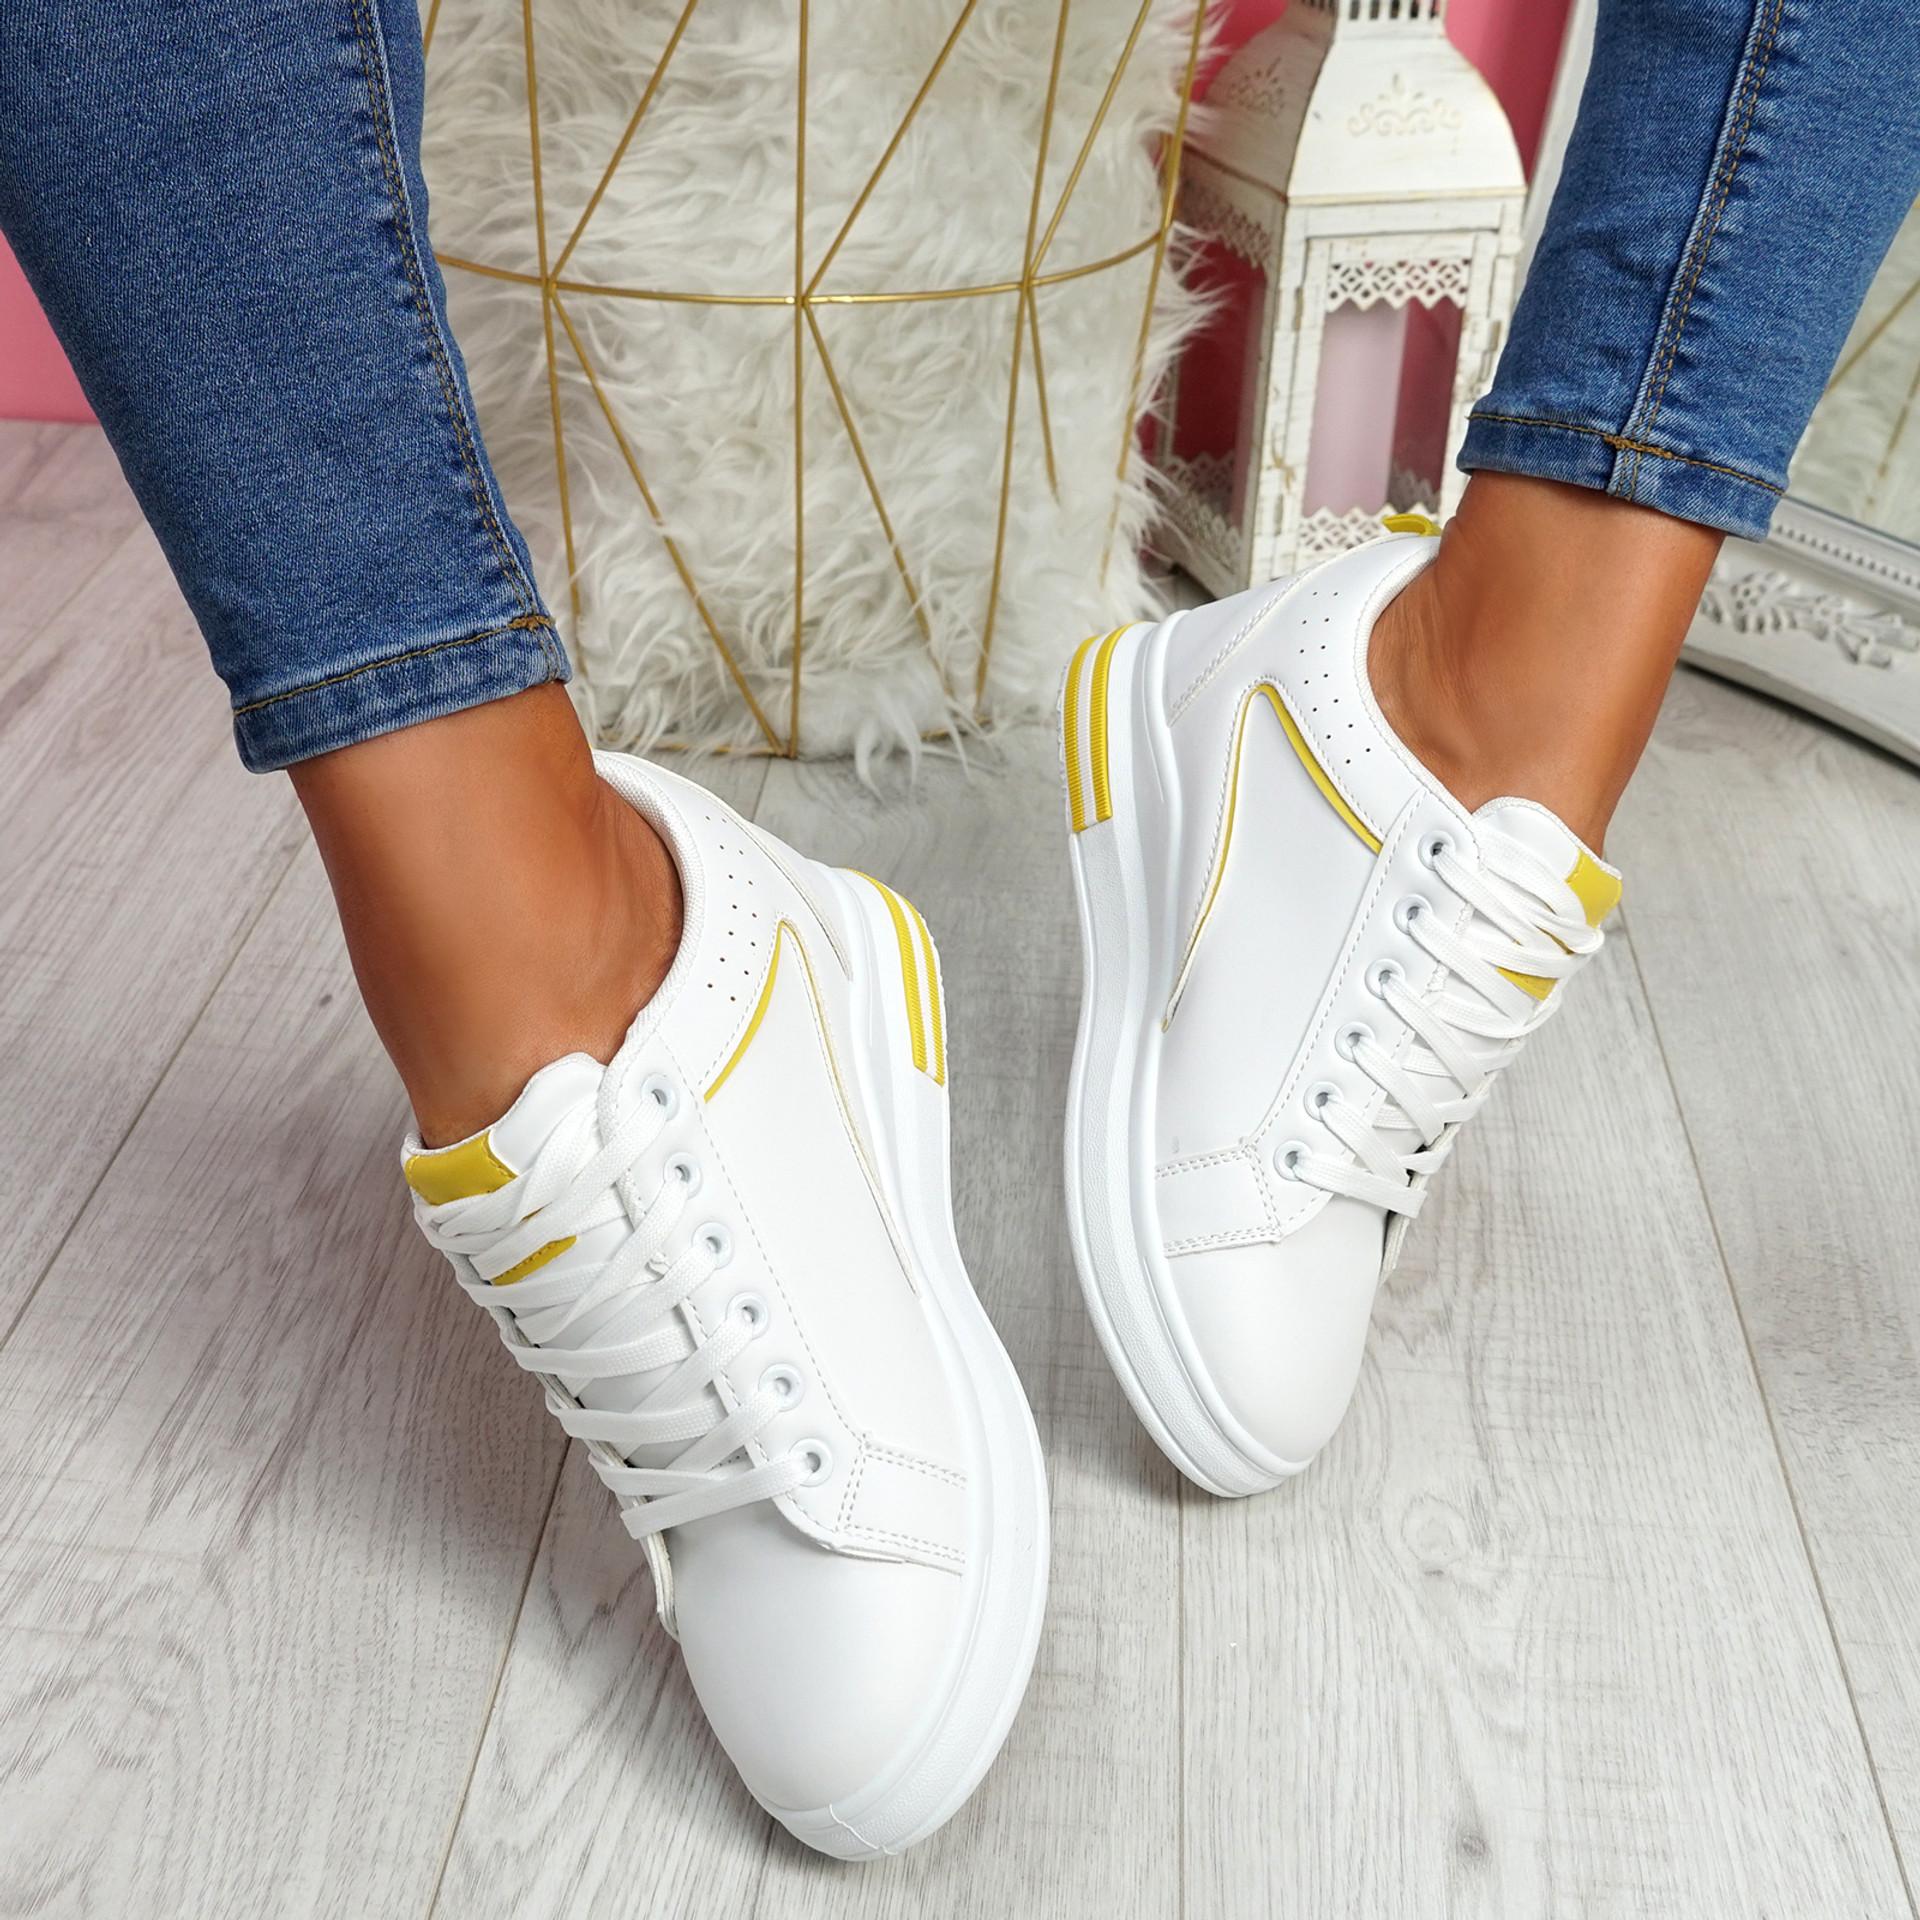 Sonna White Yellow Wedge Trainers